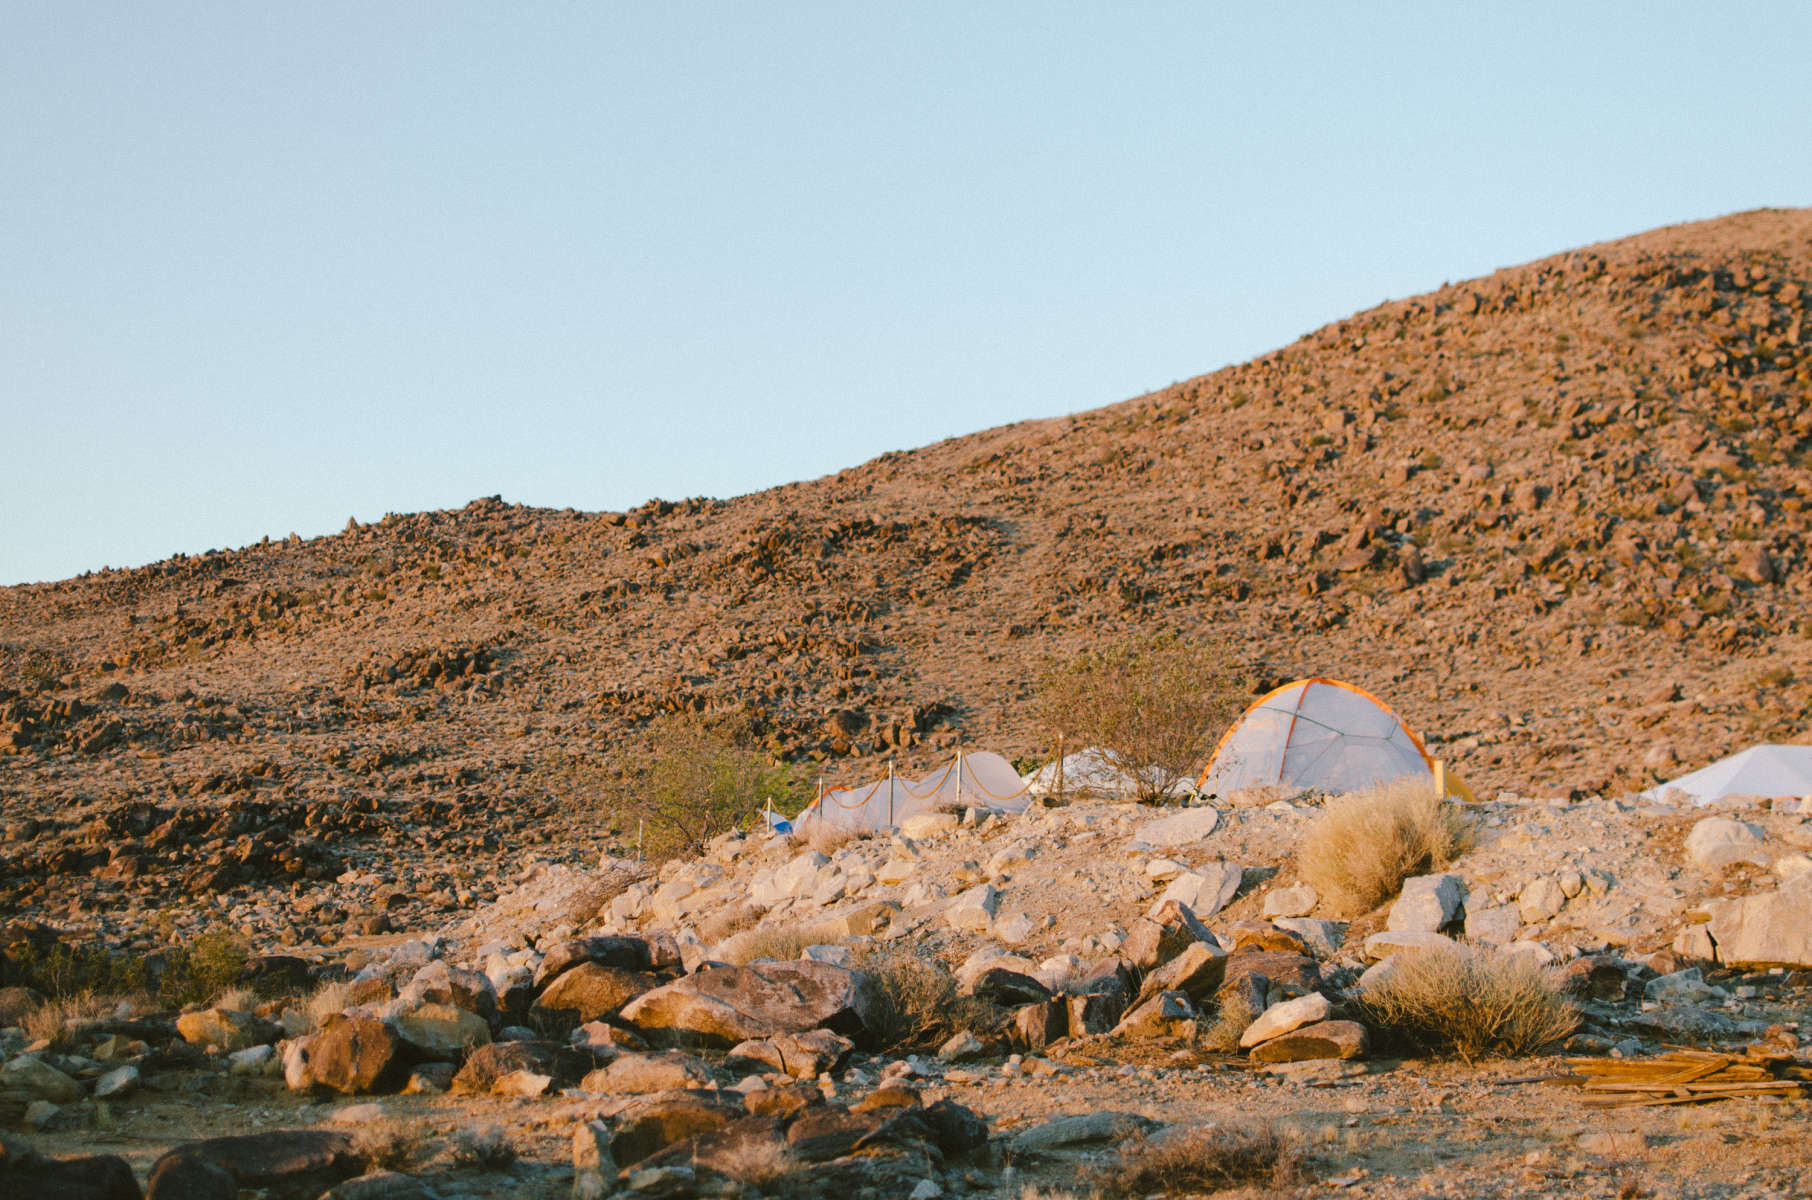 Desert Mountain Majesty Sky Camp Joshua Tree Ca 161